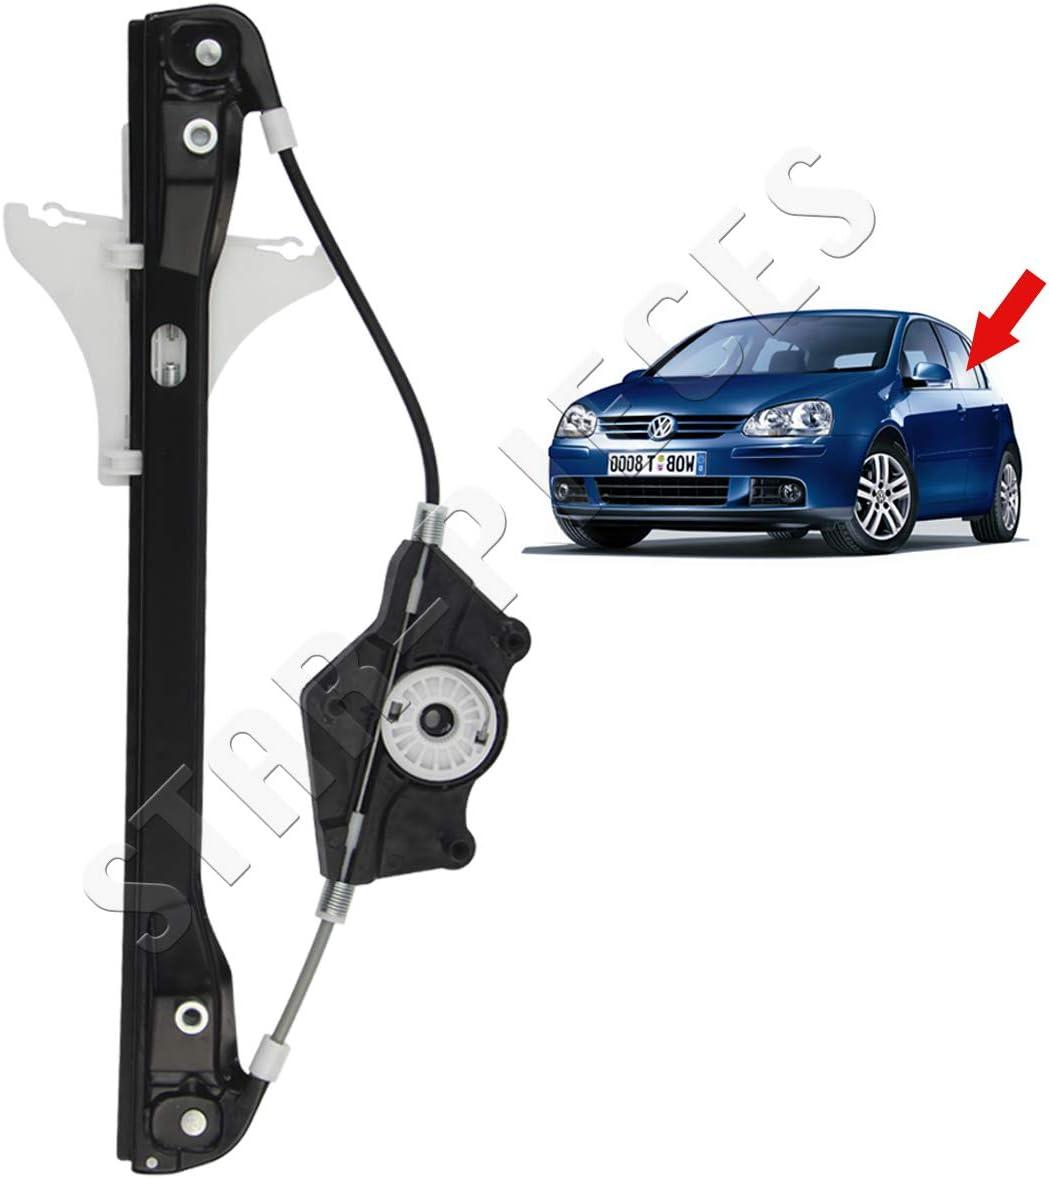 STARKIT PERFORMANCE - Mecanismo elevalunas eléctrico Trasero Izquierdo para Volkswagen Golf 5 y Jetta 3